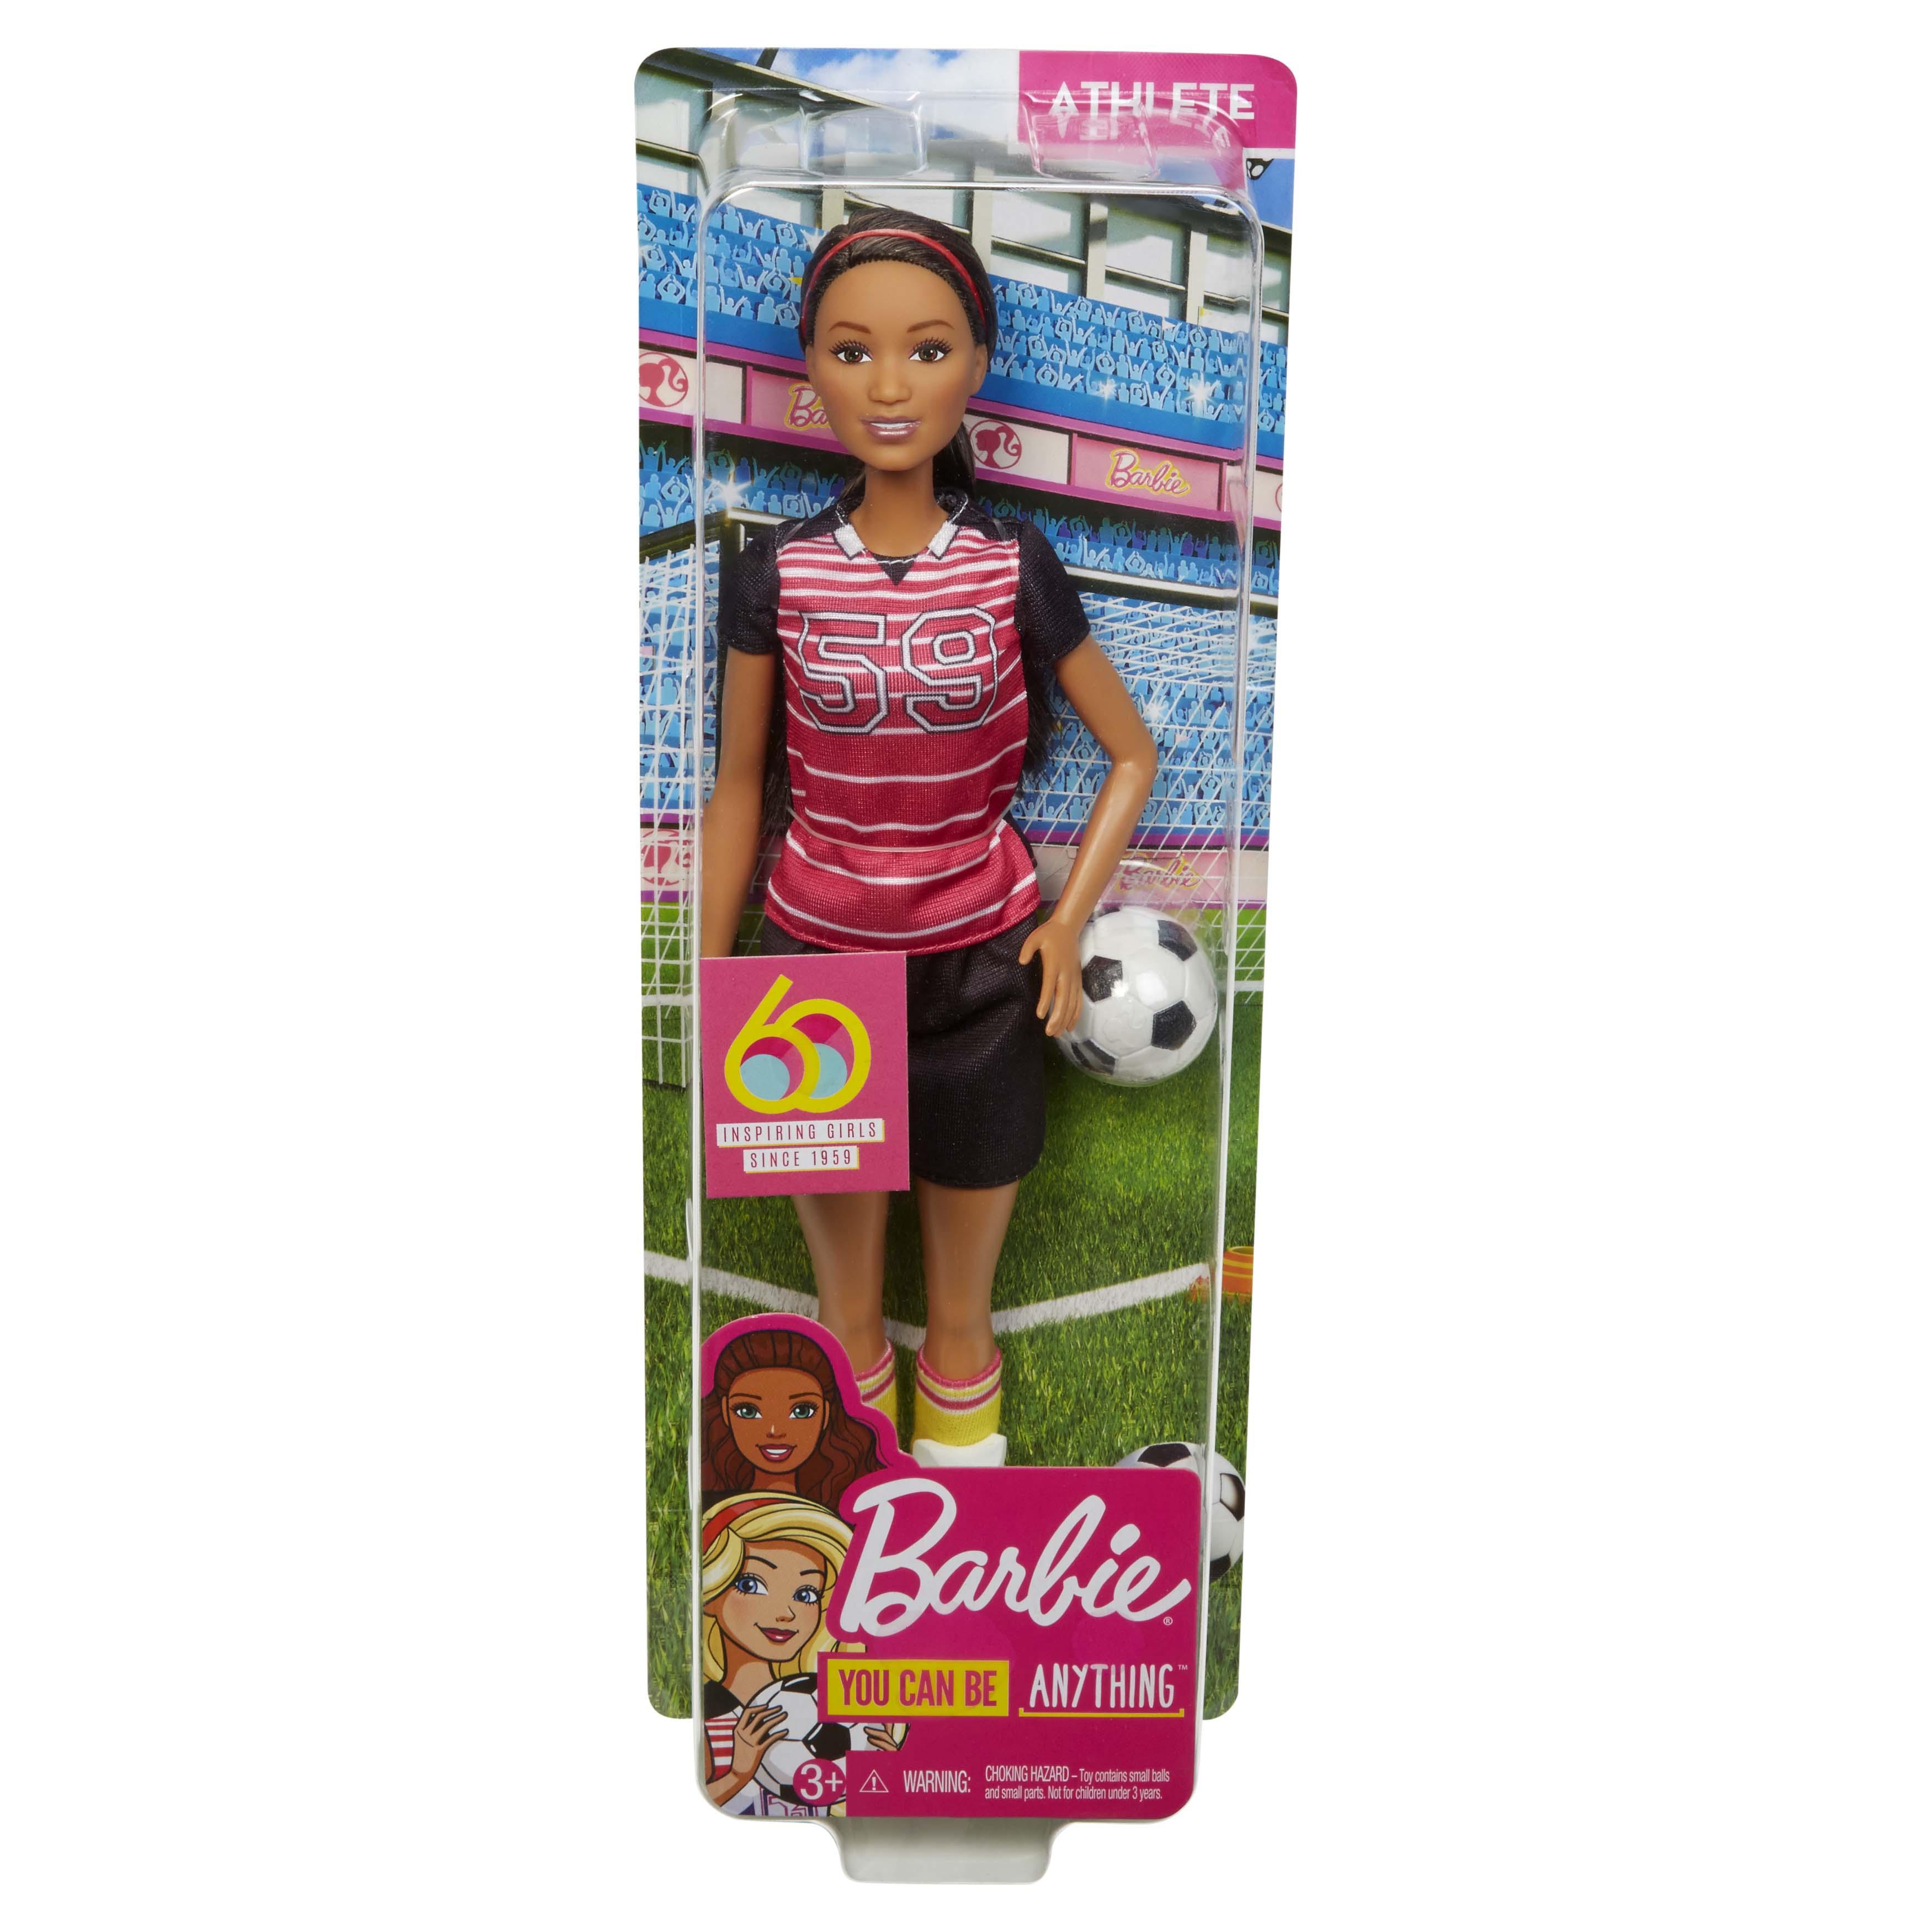 Afbeelding van Barbie 60th Anniversary Carriere Poppen Assorti